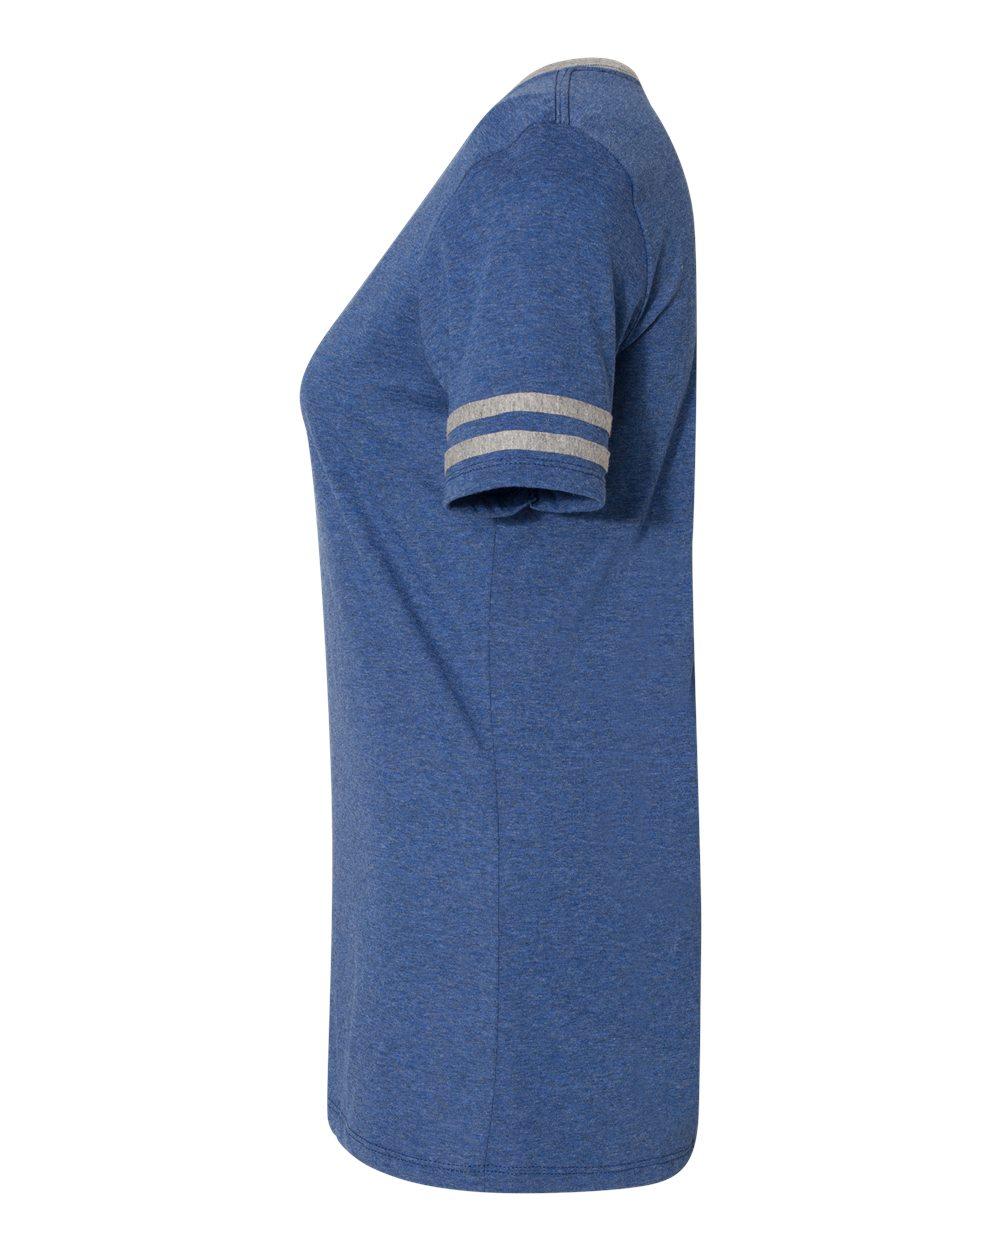 Jerzees-Triblend-Women-039-s-V-Neck-Varsity-T-Shirt-602WVR thumbnail 23